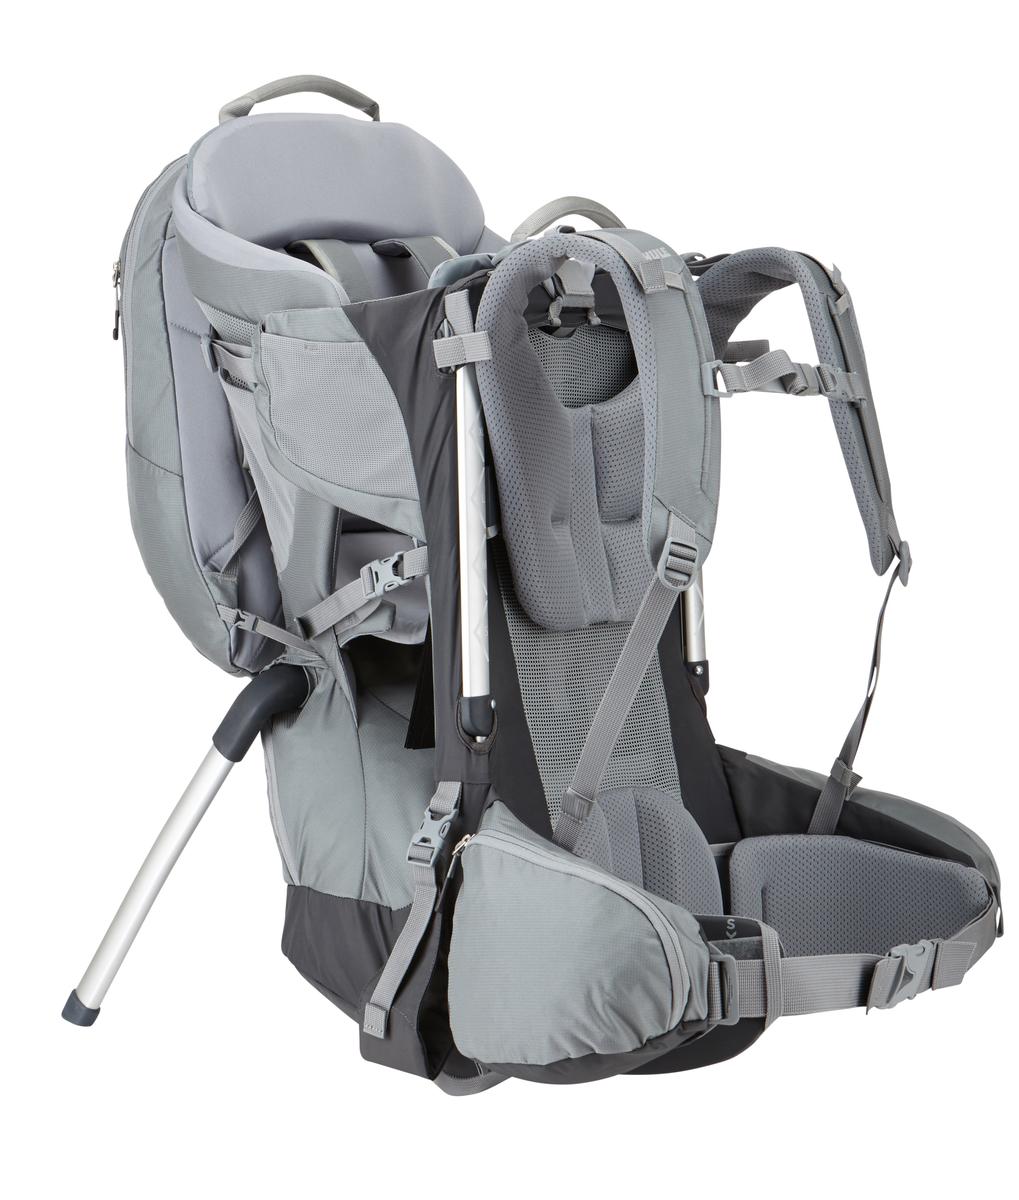 Рюкзак для переноски детей Thule Sapling Elite Child Carrier, цвет: серый, 32л установочный комплект для багажника thule 1408